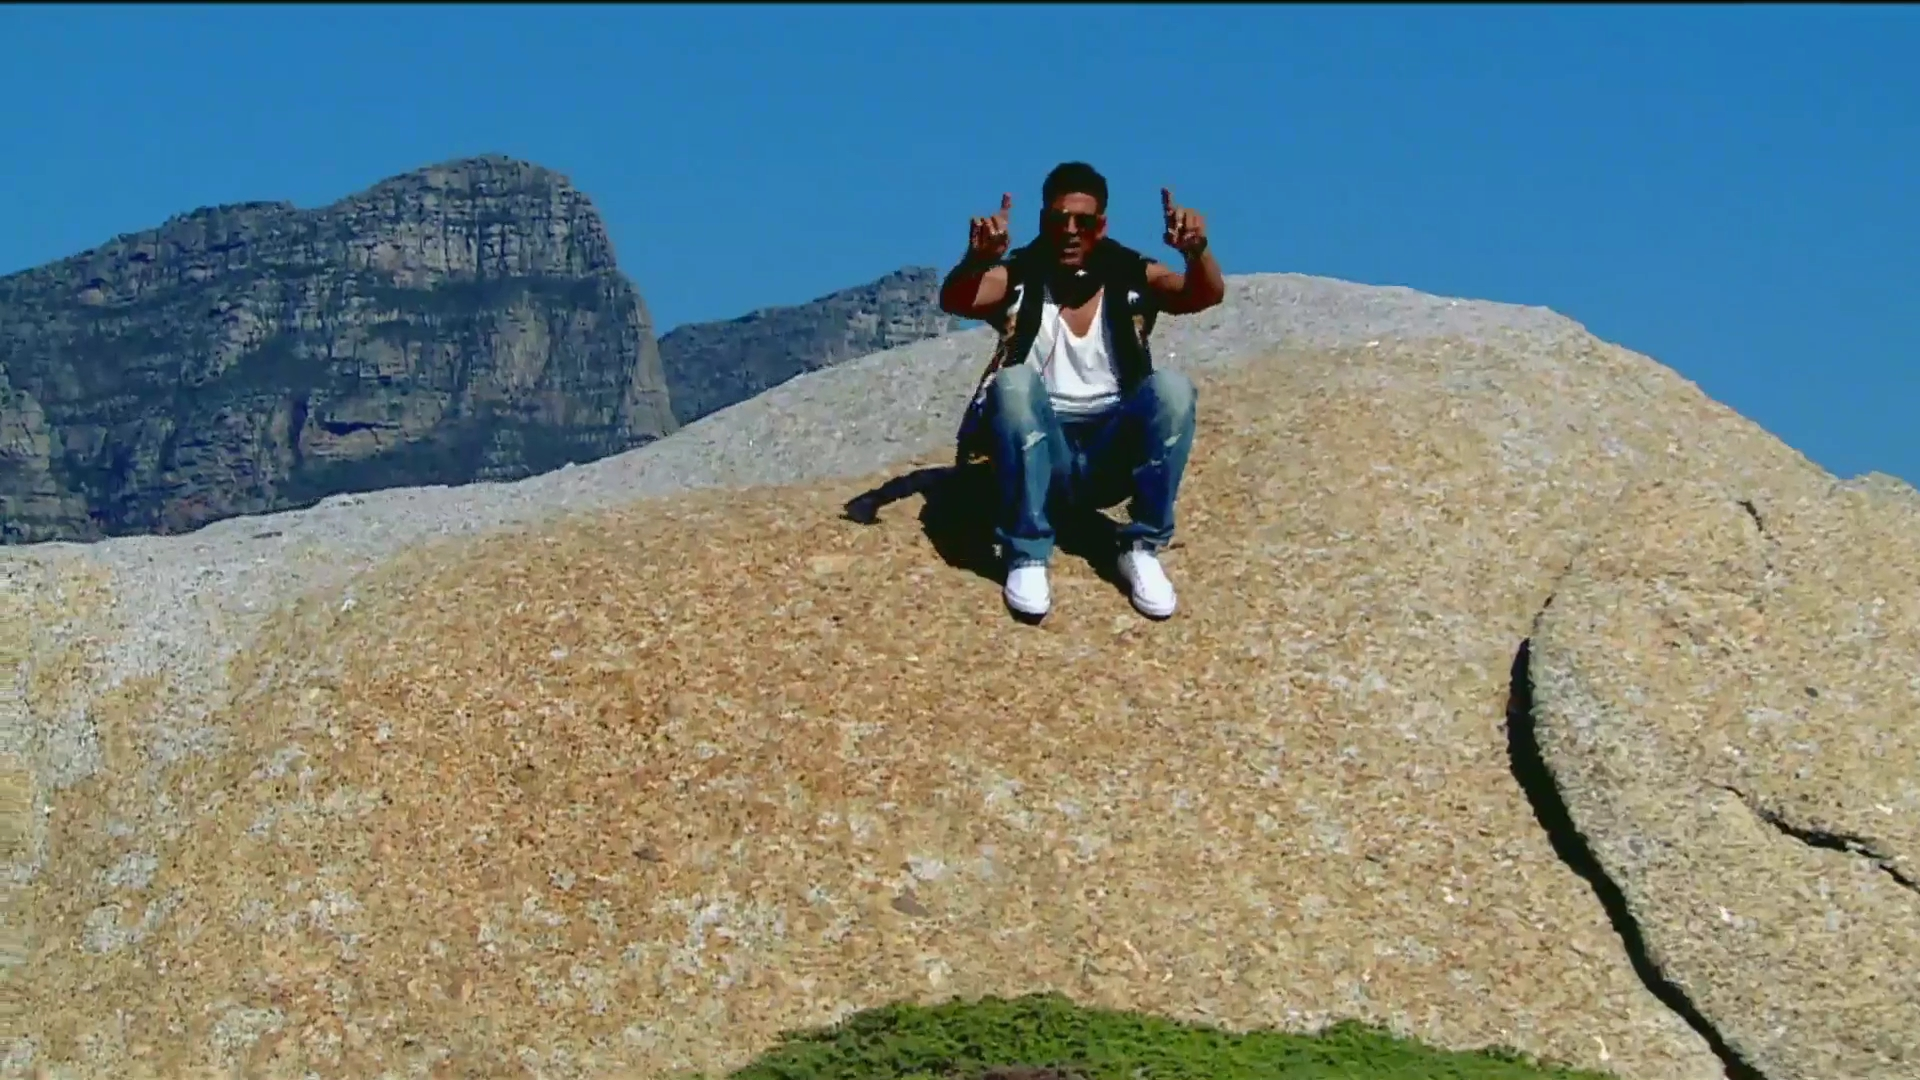 z_2014 - Dare2dance rap song_1080p.mp47193.jpg